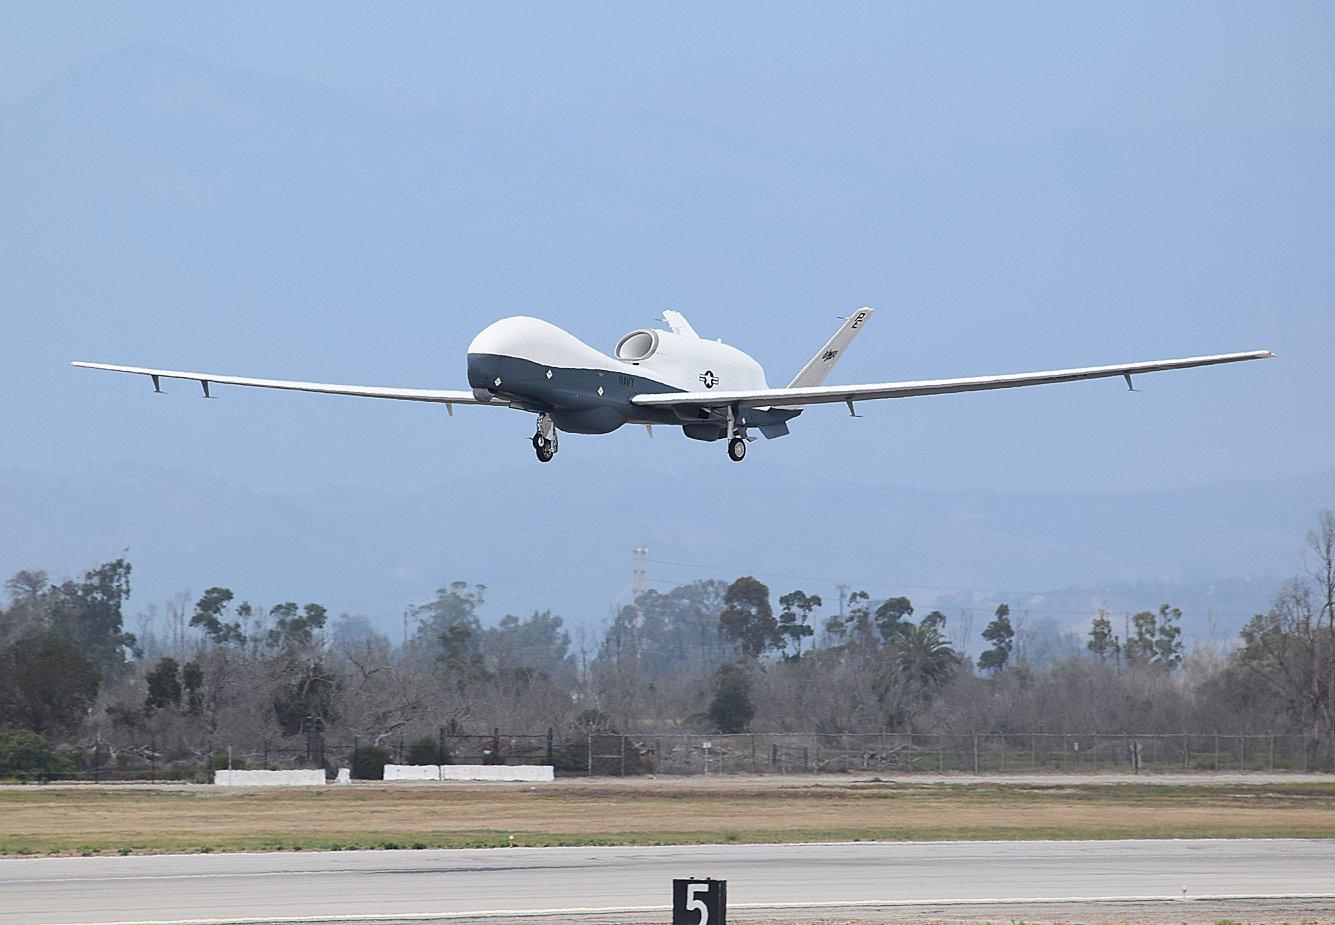 MQ-4C Triton arrives in Guam - Unmanned Vehicles